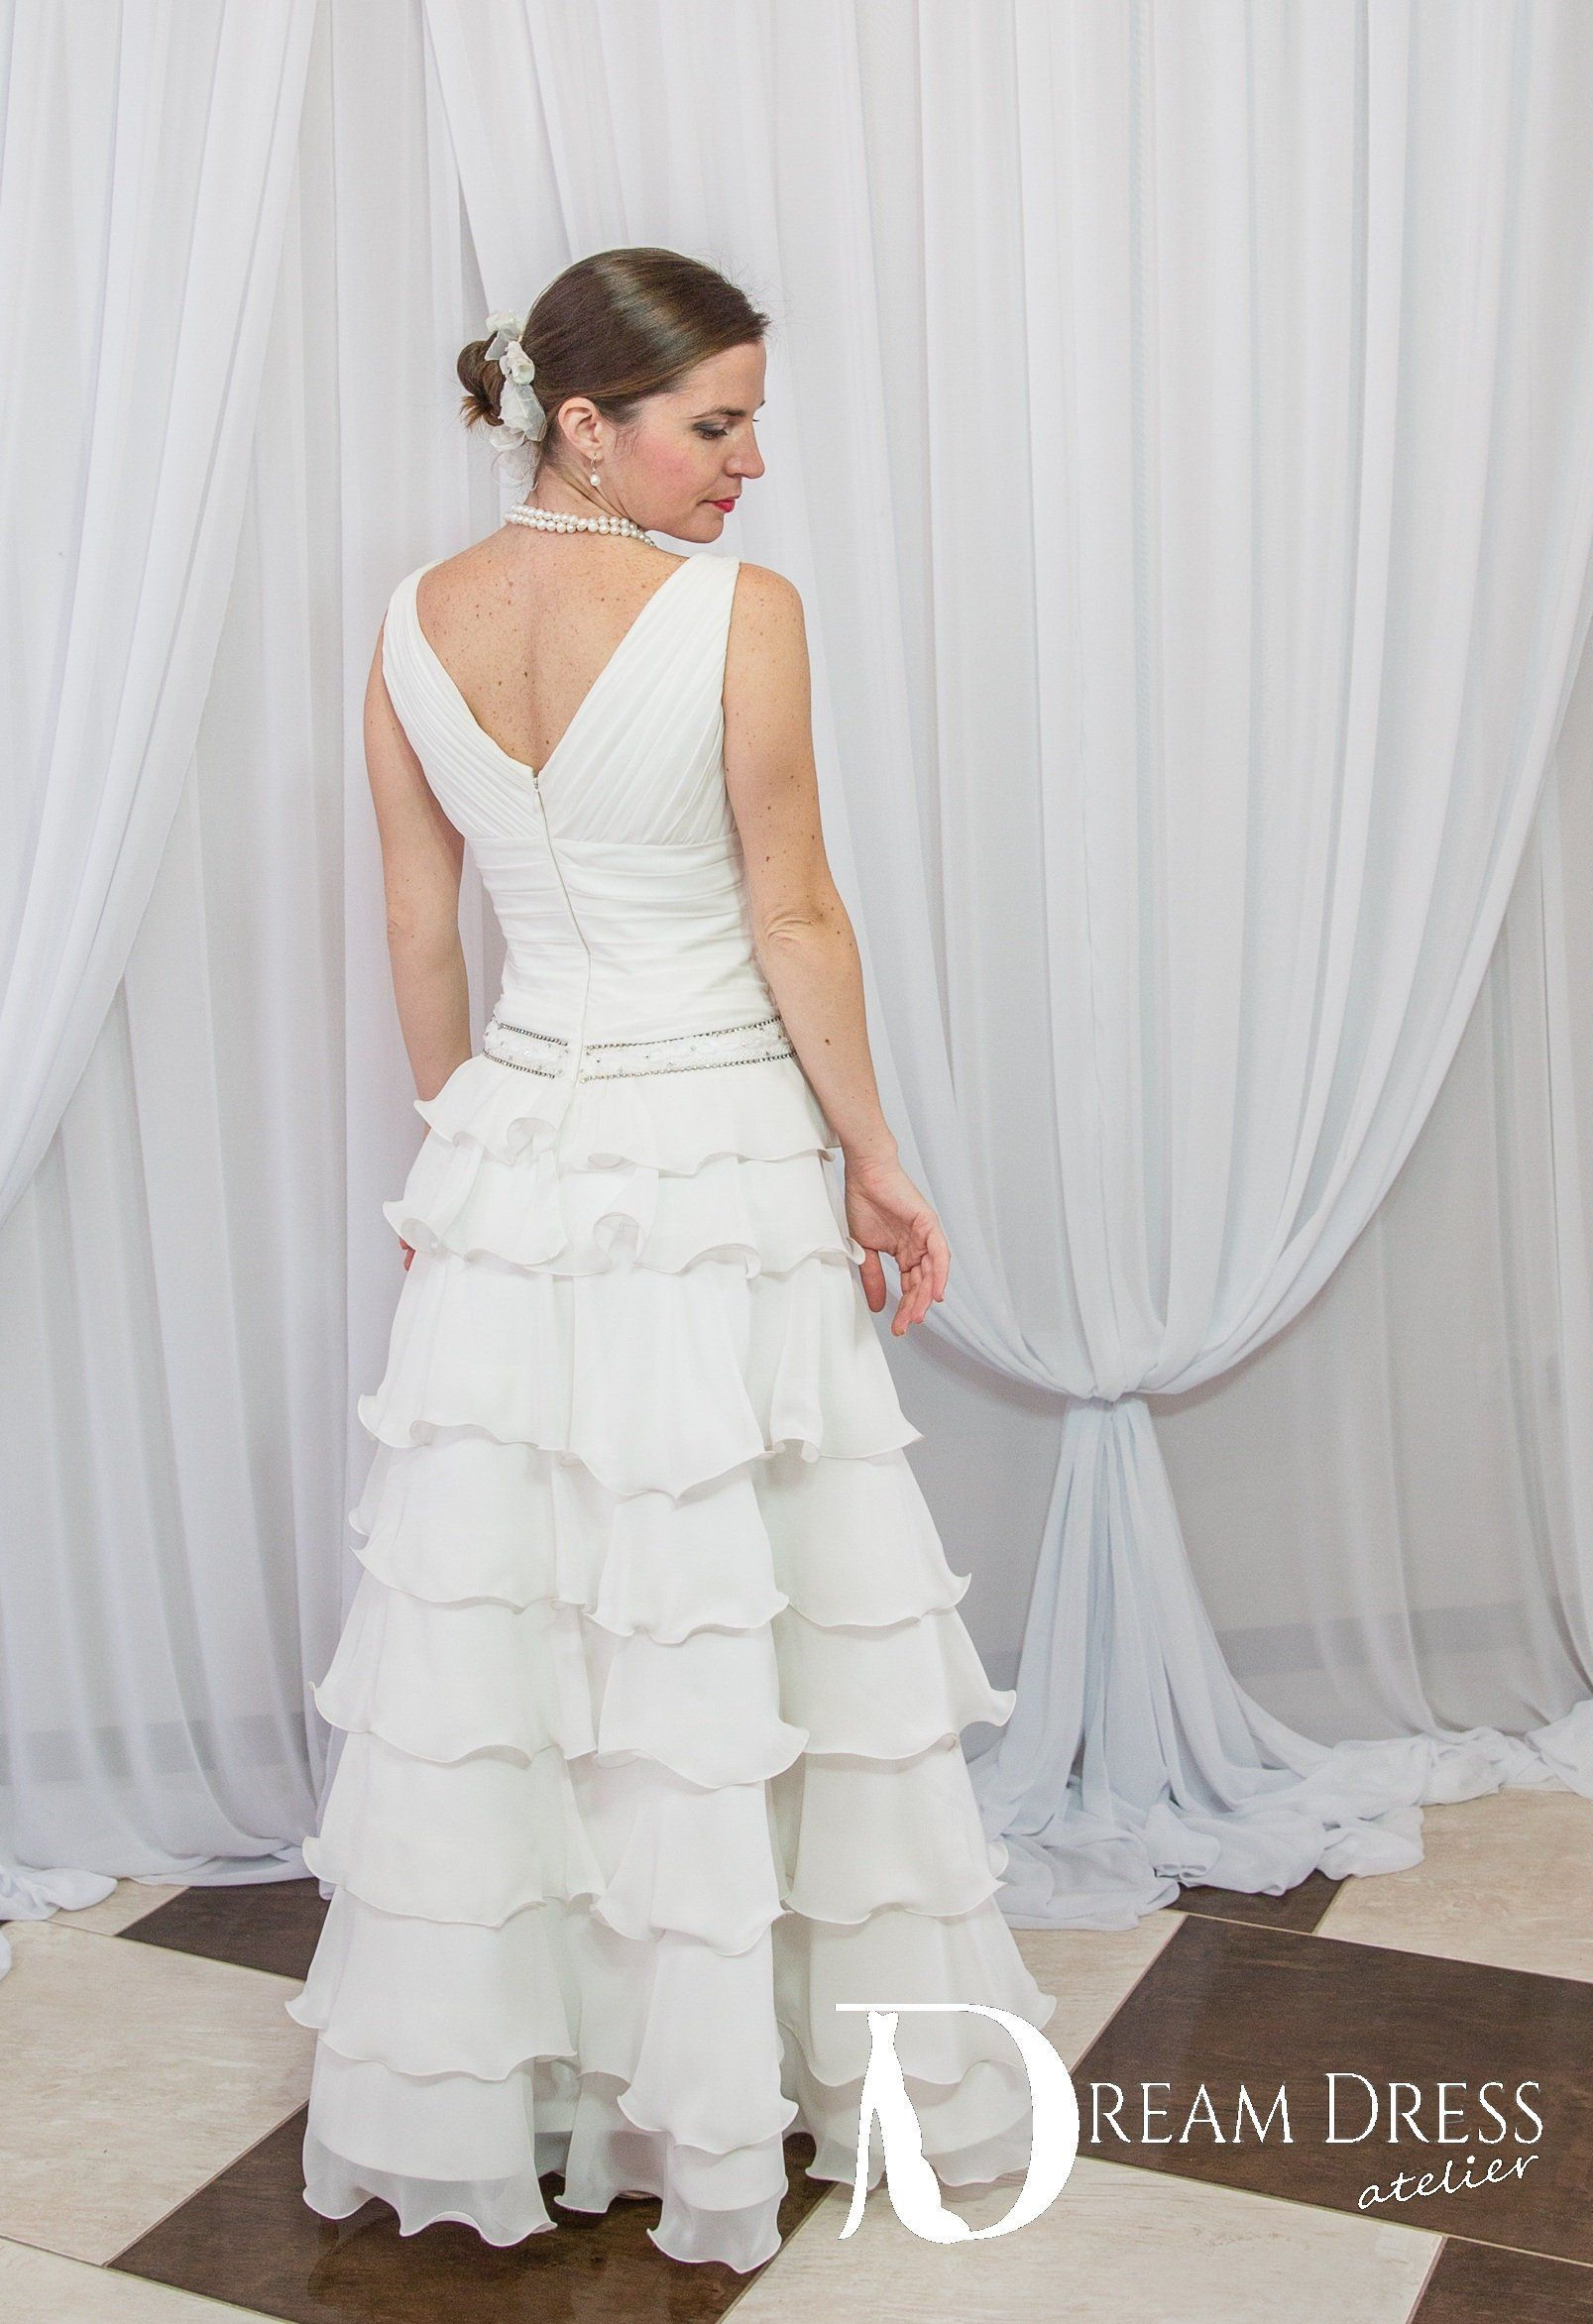 6556340eb07 7 Surprising Unique Ideas  Wedding Gowns Mermaid Sleeves rustic wedding  gowns bohemian.Summer Wedding Gowns Guest linen wedding dresses bohemian.